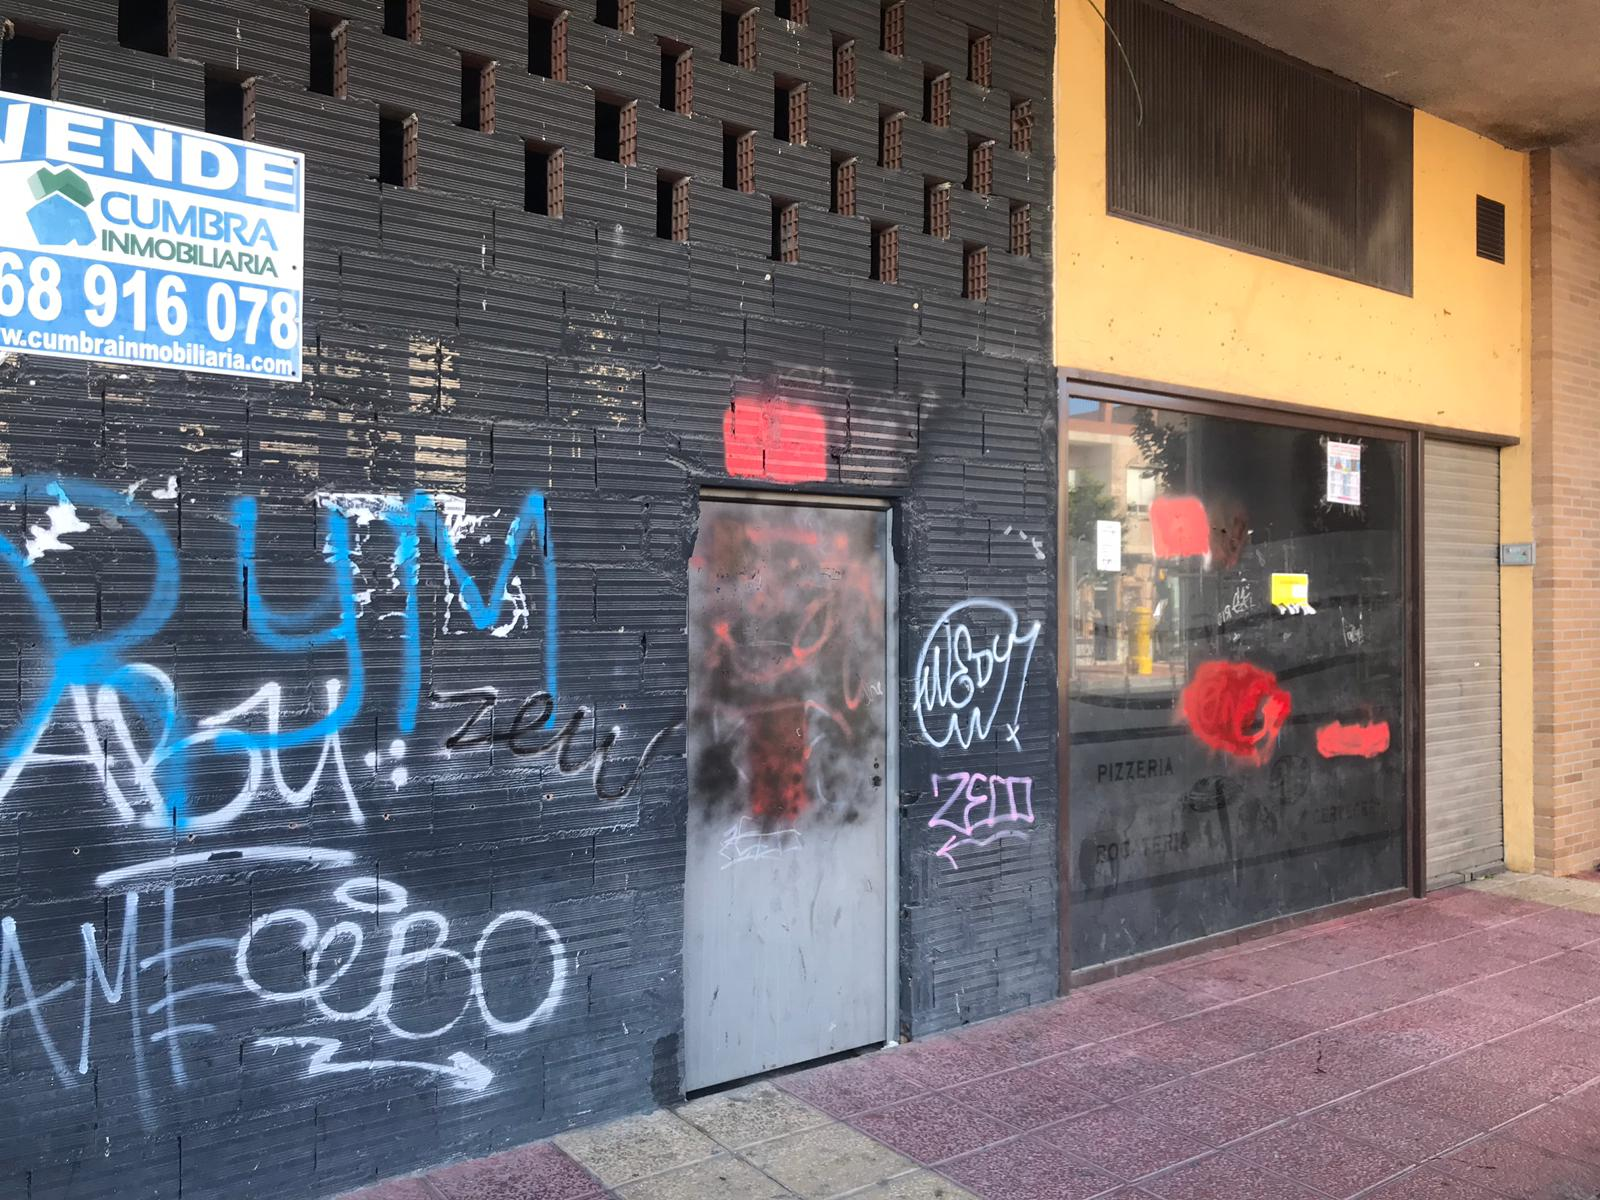 Local en venta en Murcia, Murcia, Calle Mayor, 148.000 €, 250 m2